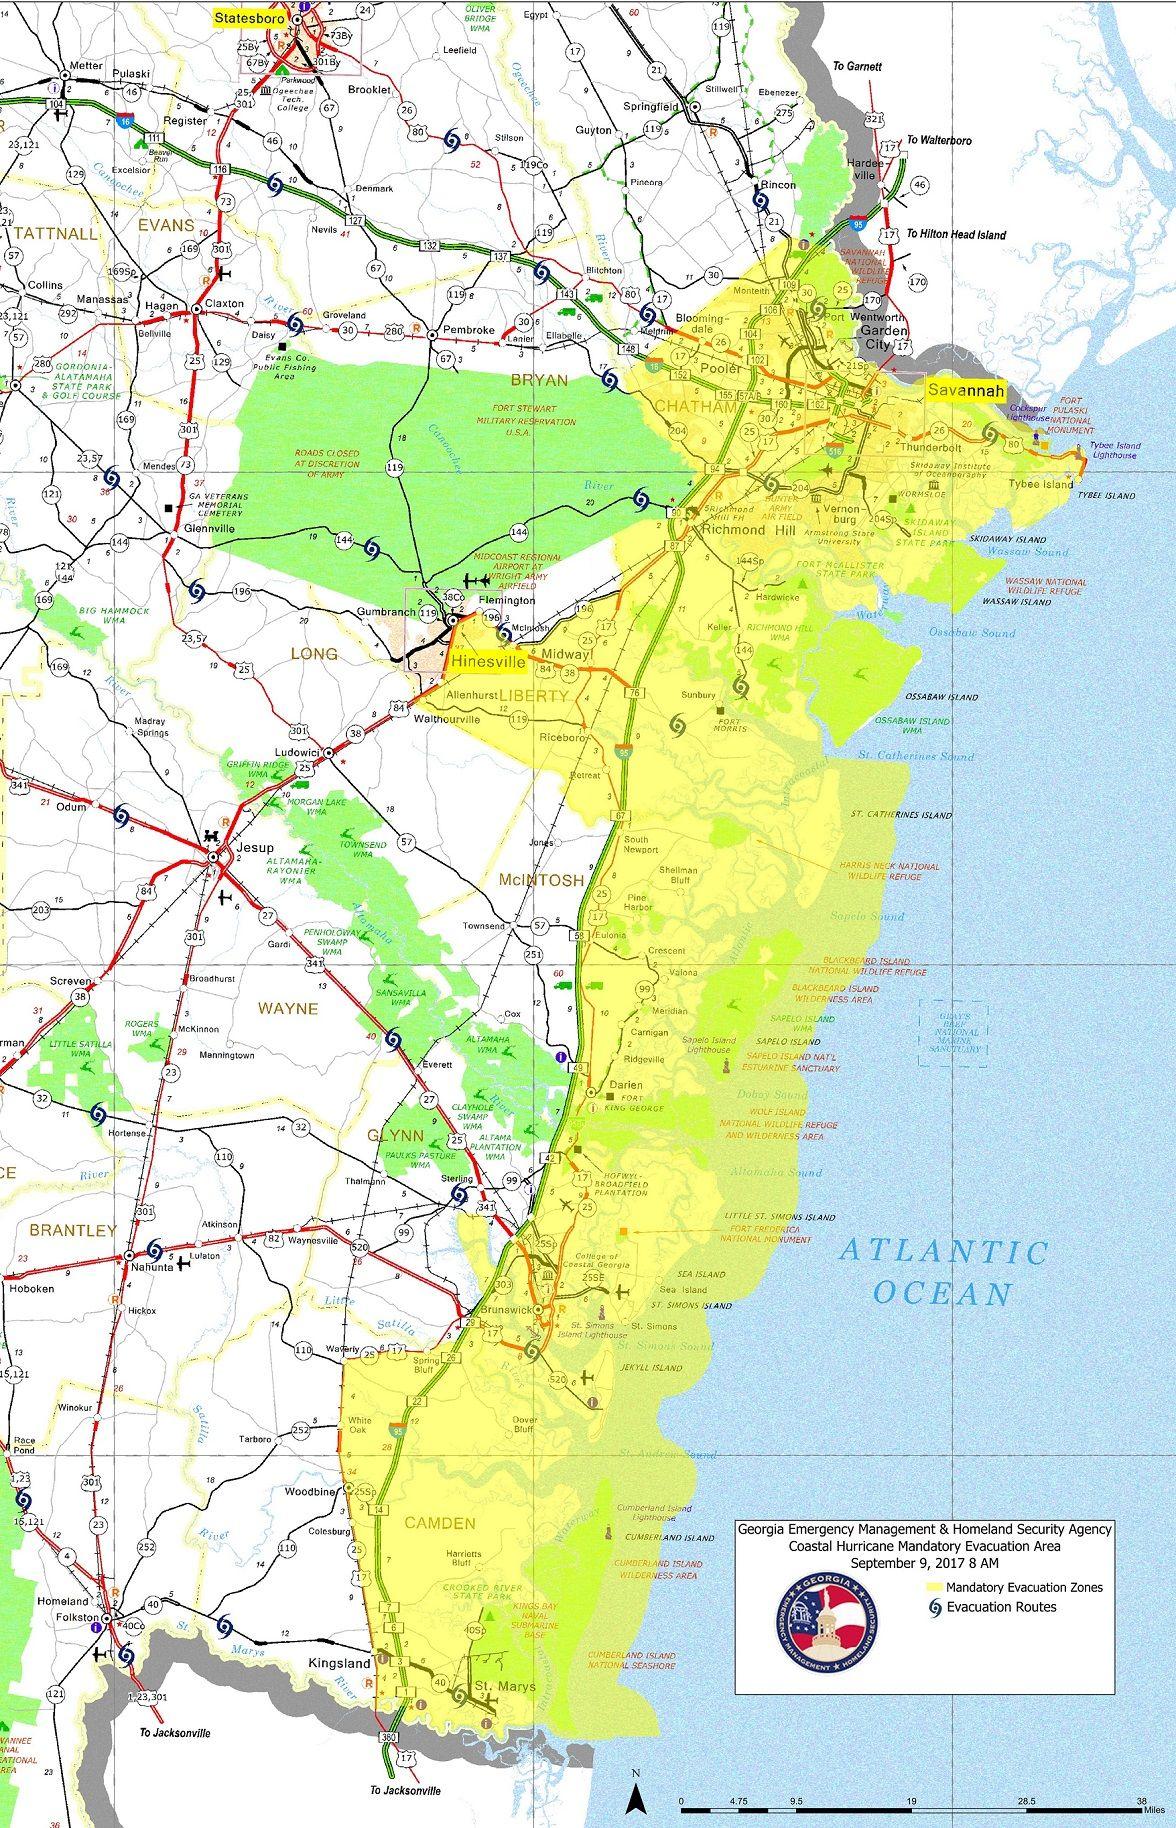 Mandatory Evacuation Zones Irma Jpg 1176 1828 Evacuation Hurricane Weekend Is Over